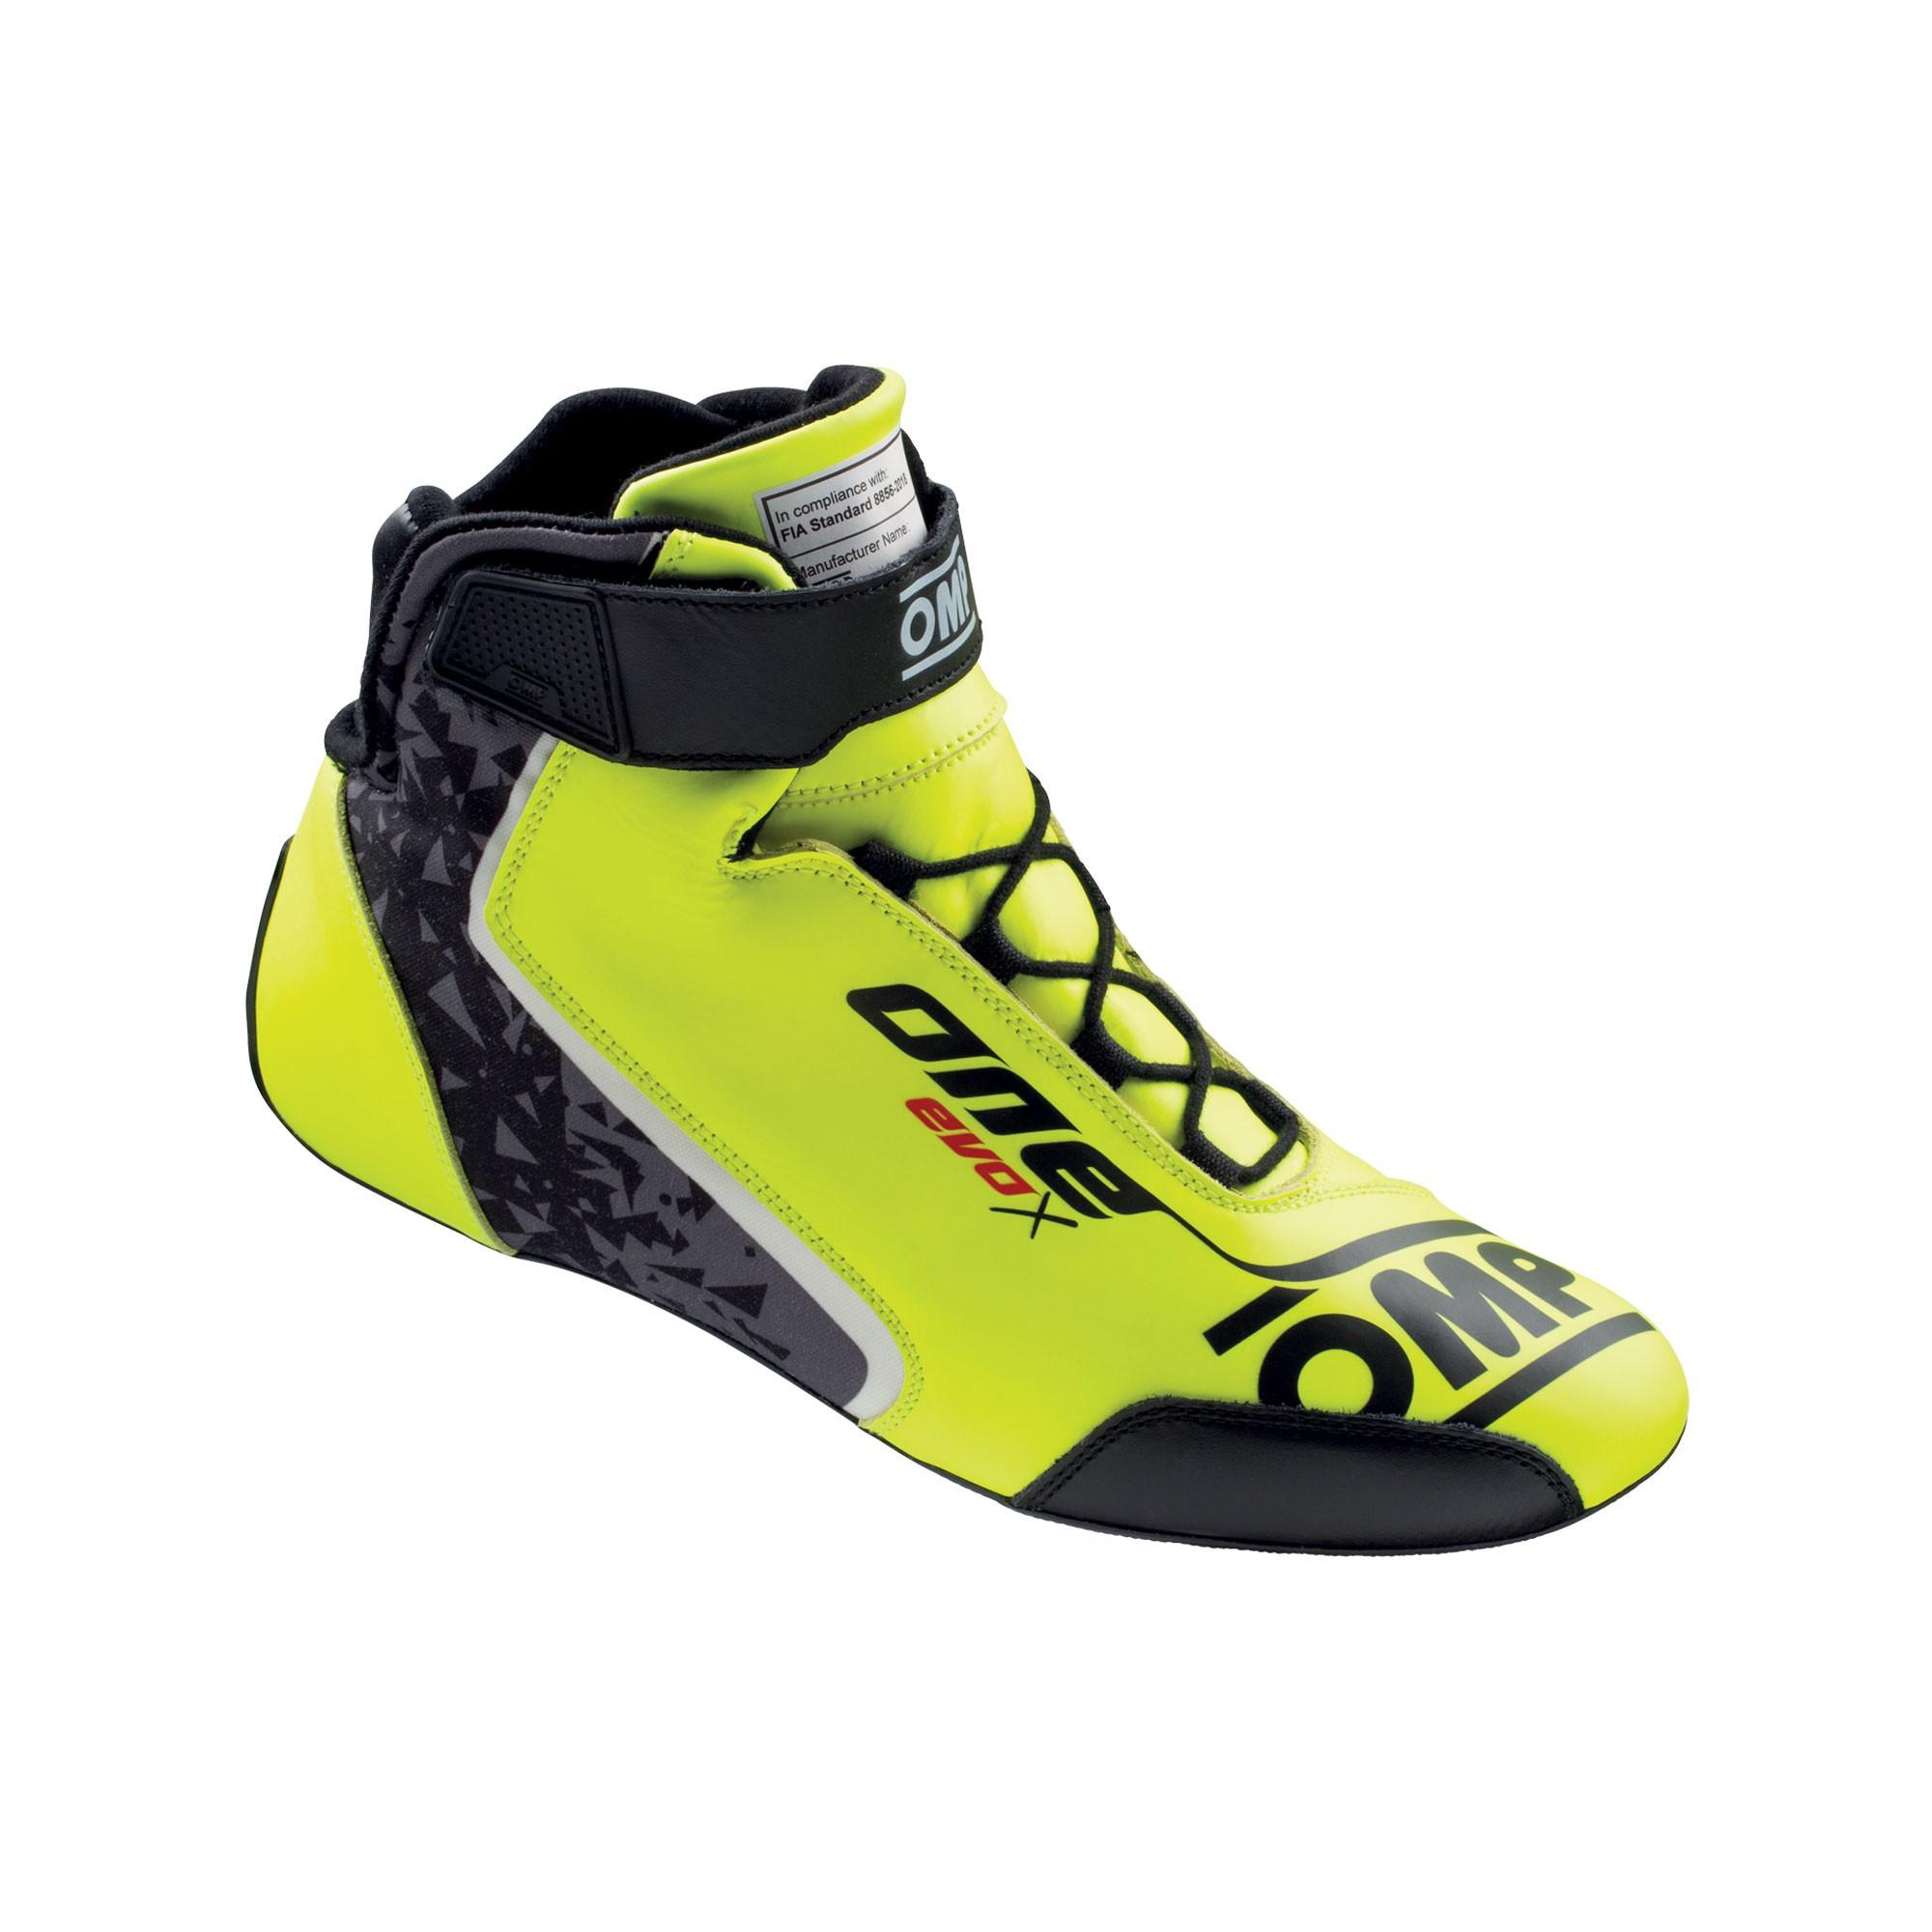 ONE EVO X Shoes